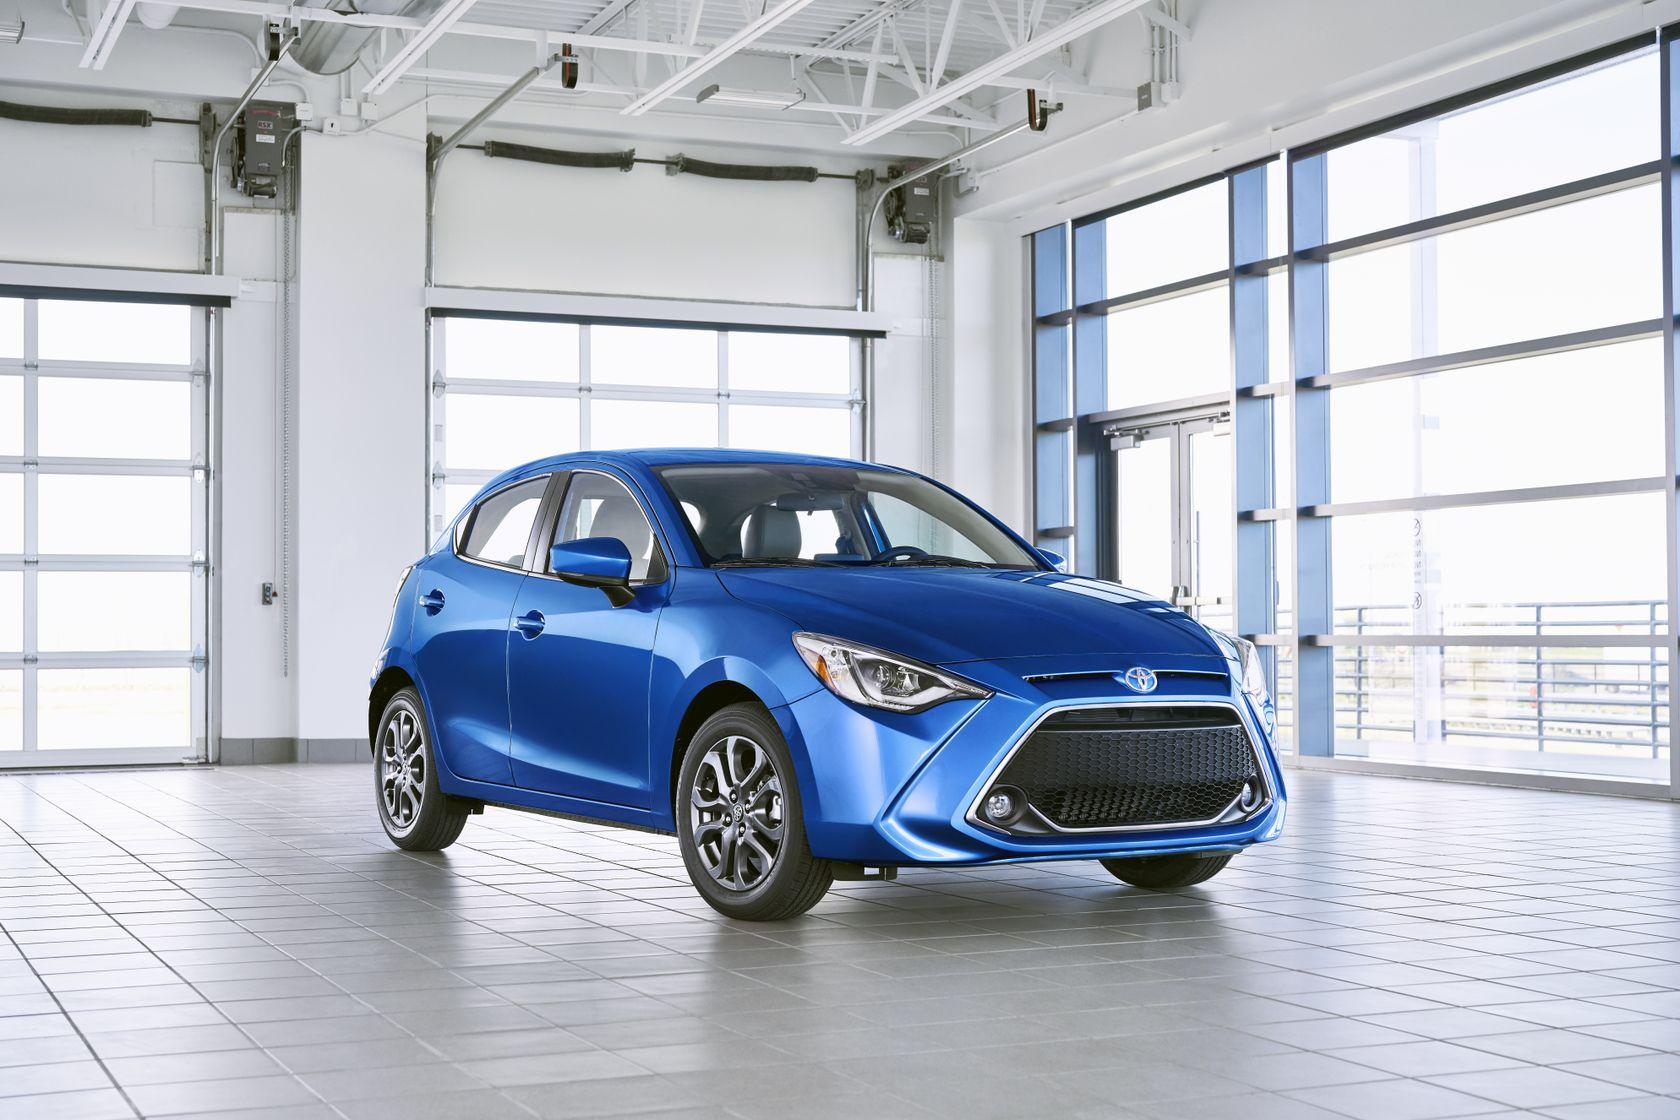 2020 Toyota Yaris Hatchback 01